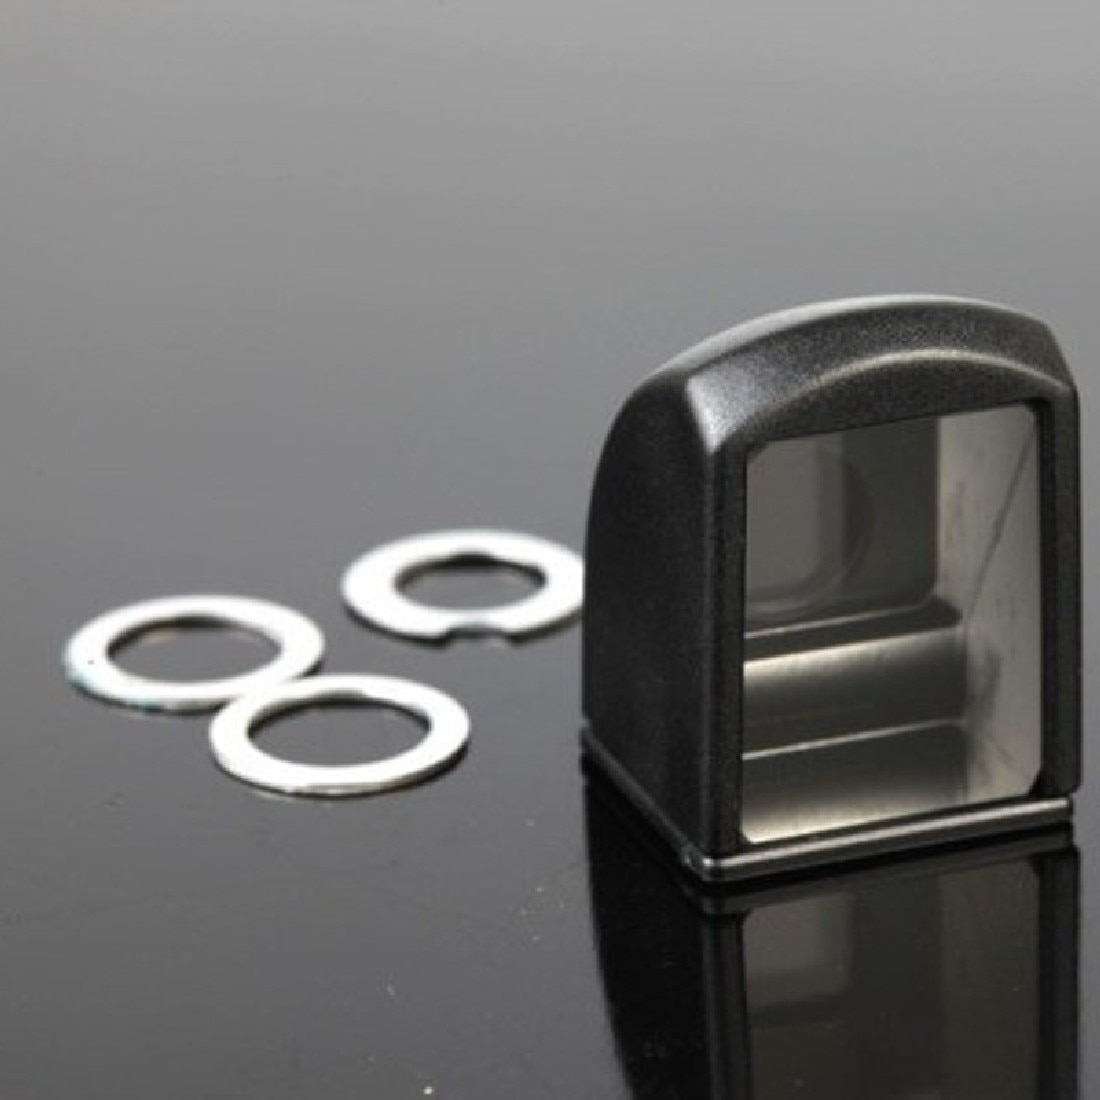 Etmakit Multi-ángulo Universal Mini objetivo del periscopio magnético desmontable lente de teléfono móvil para iPhone Samsung HTC